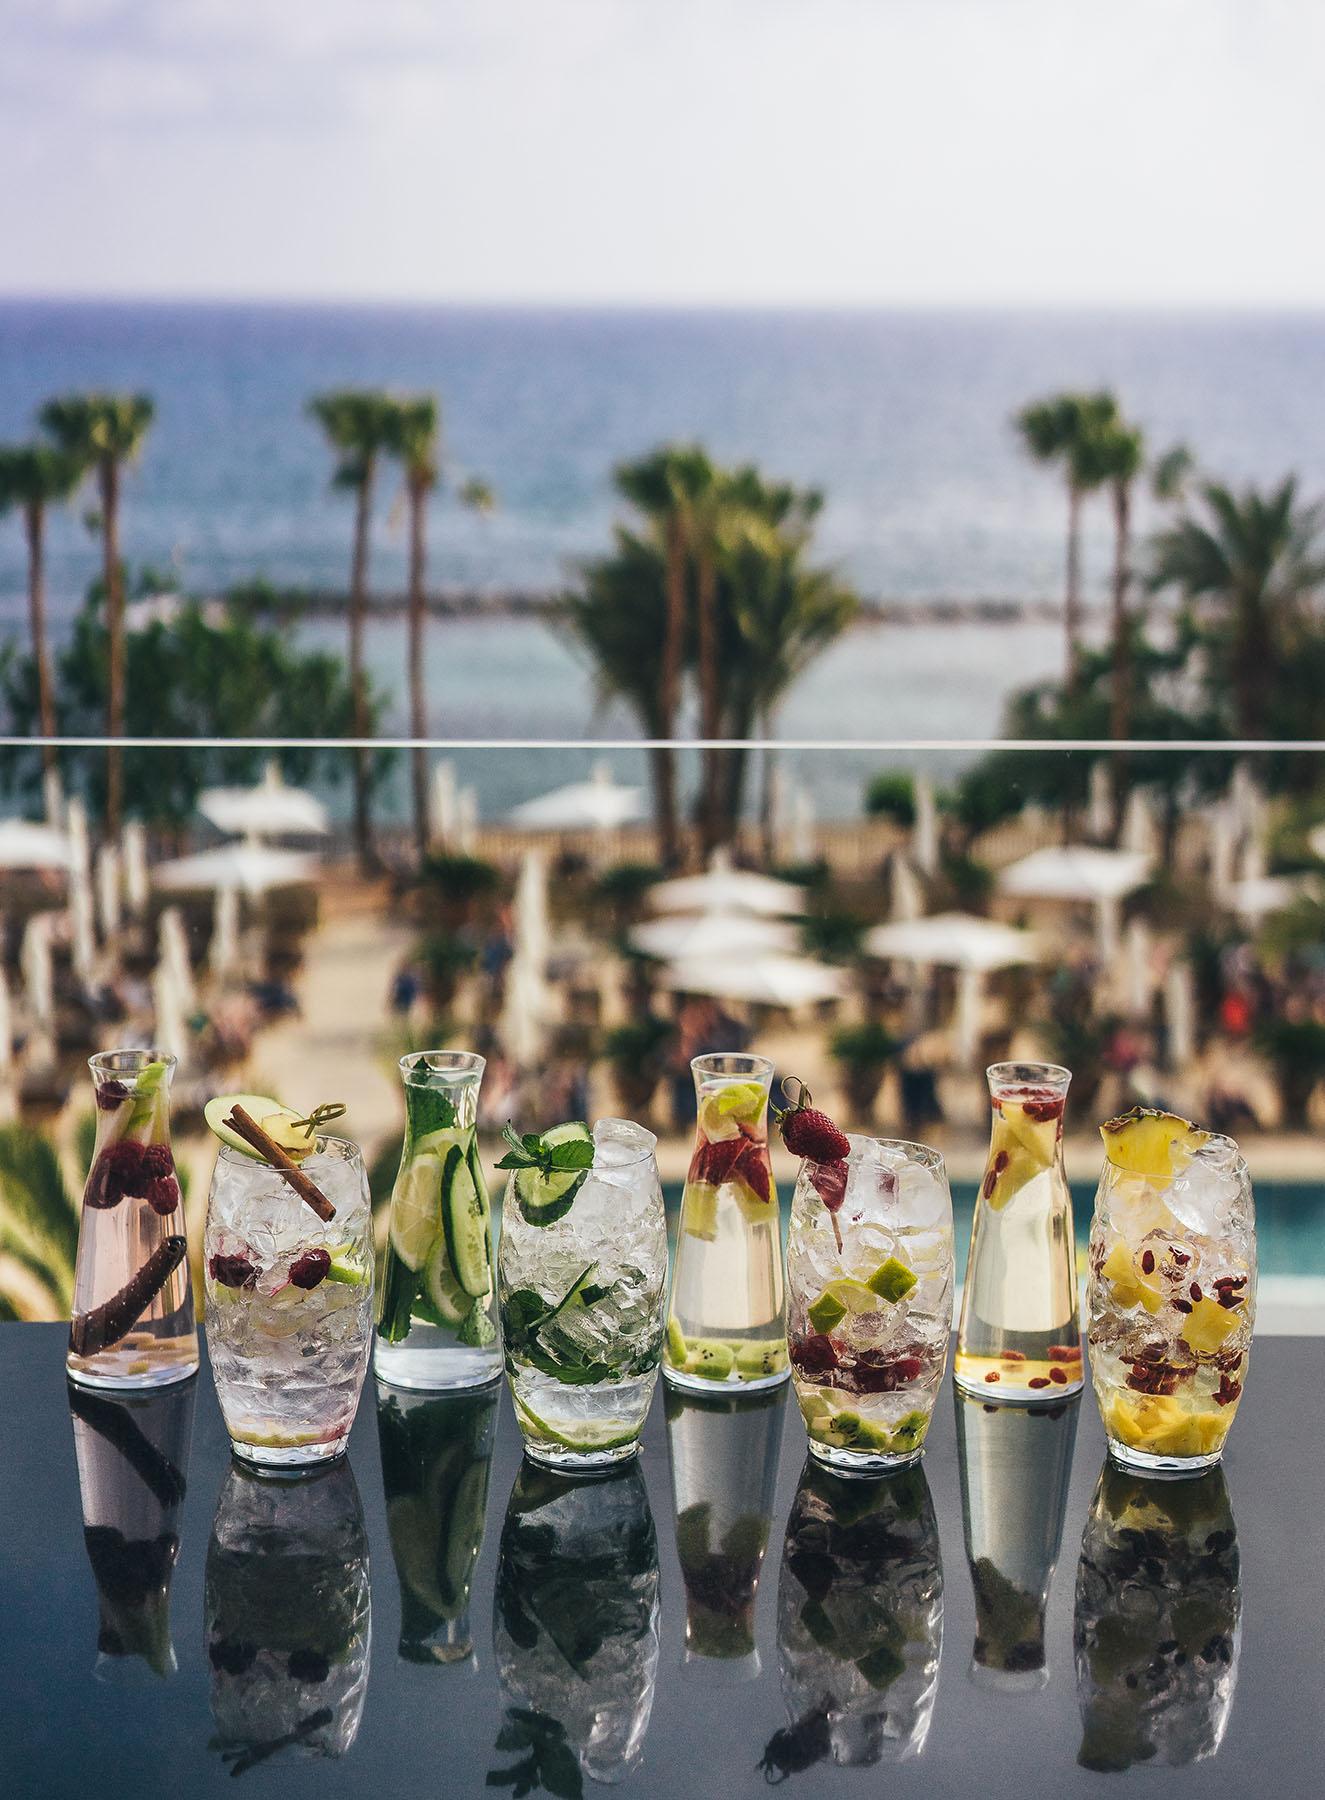 Annabelle_Ouranos_-_Infused_Water_(Lemon__Cucumber__Mint_-_Pineapple__Goji_berries_-_Kiwi__strawberries__lime)_(4).JPG